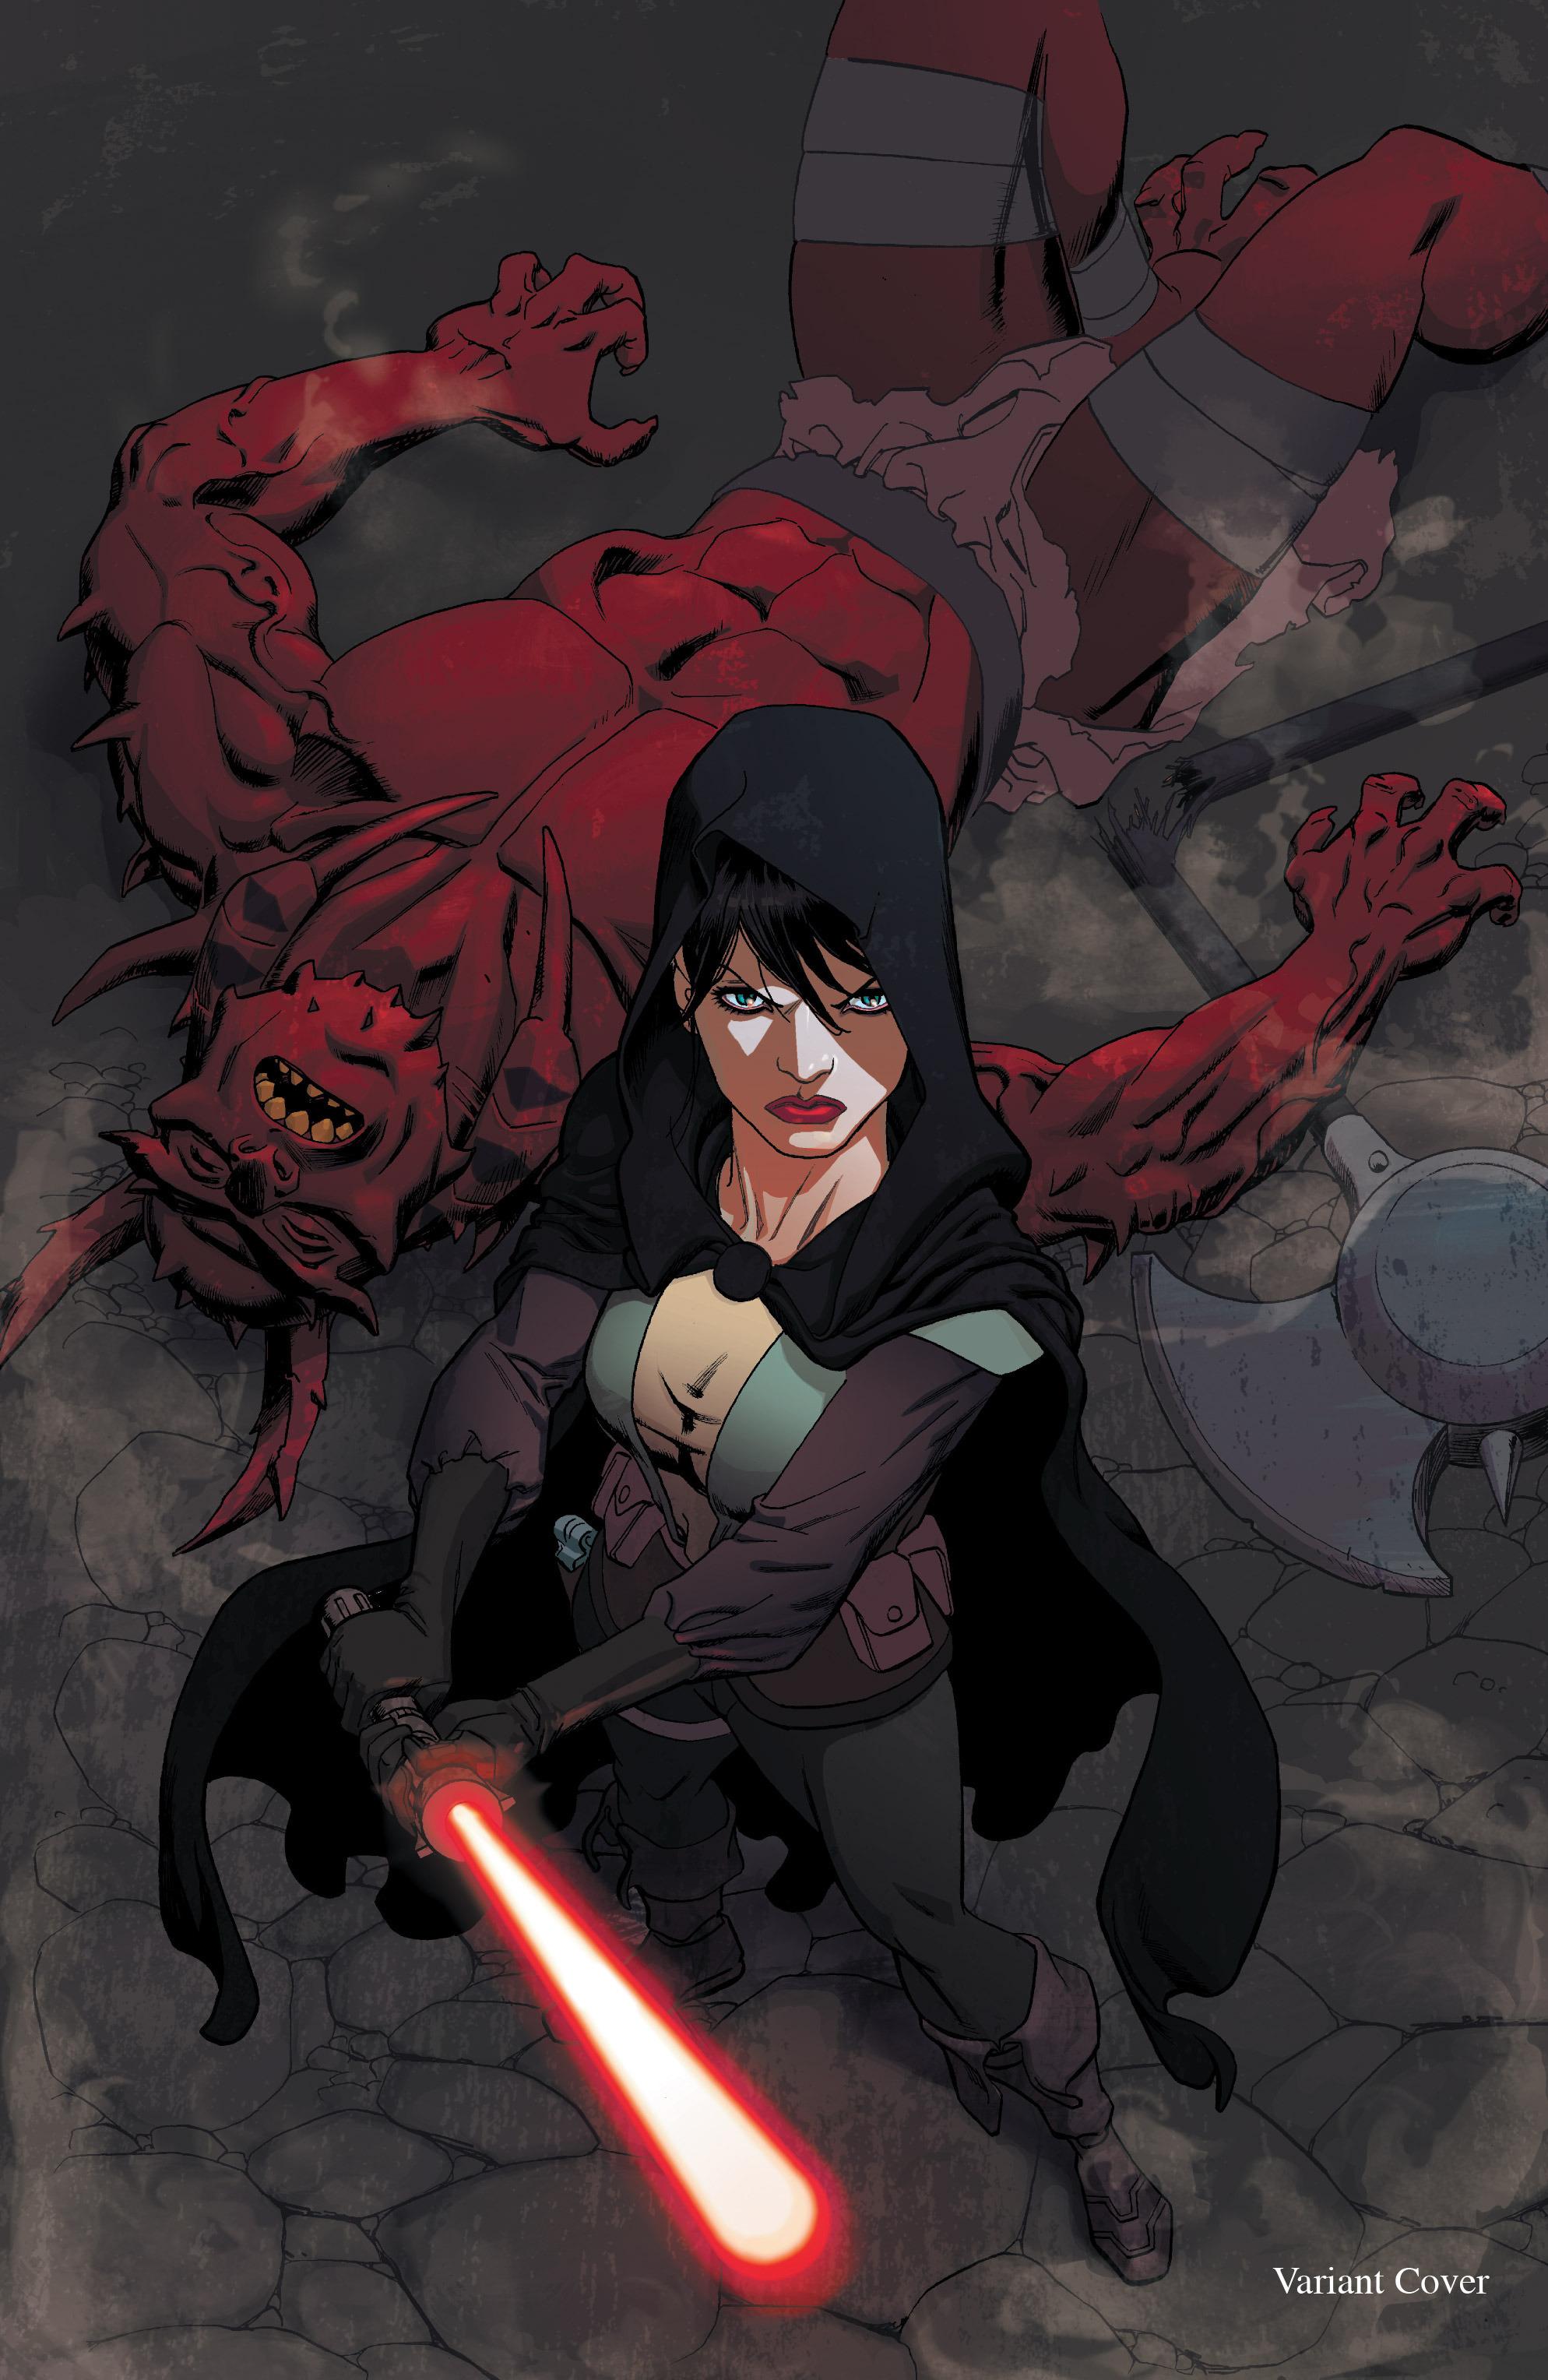 Read online Star Wars: Knight Errant - Escape comic -  Issue #1 - 25